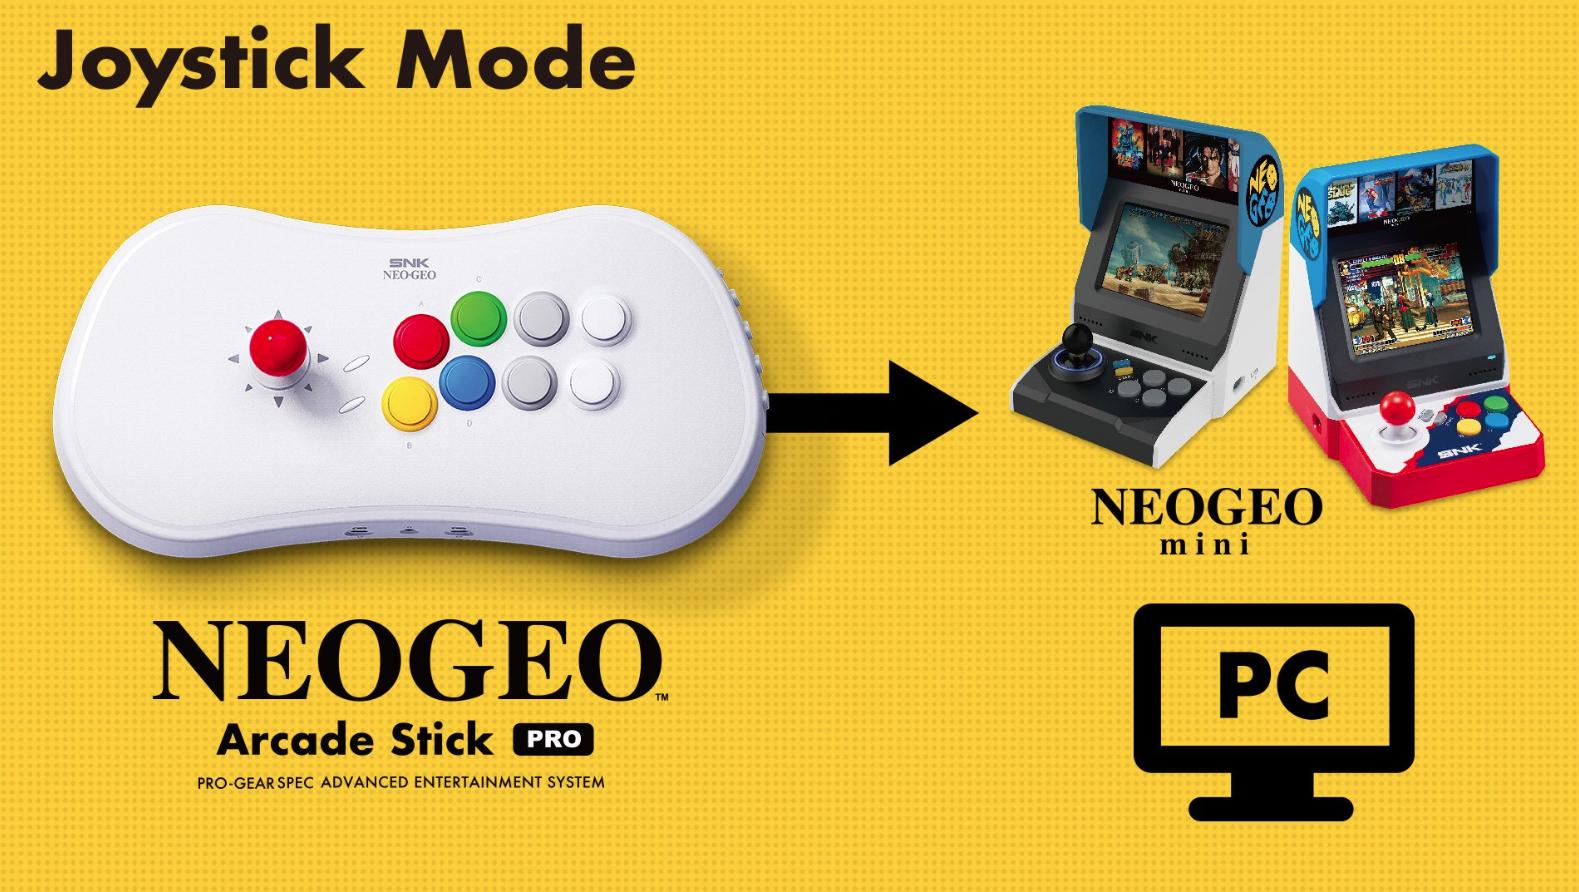 NEOGEO Arcade Stick Pro Joystick Mode